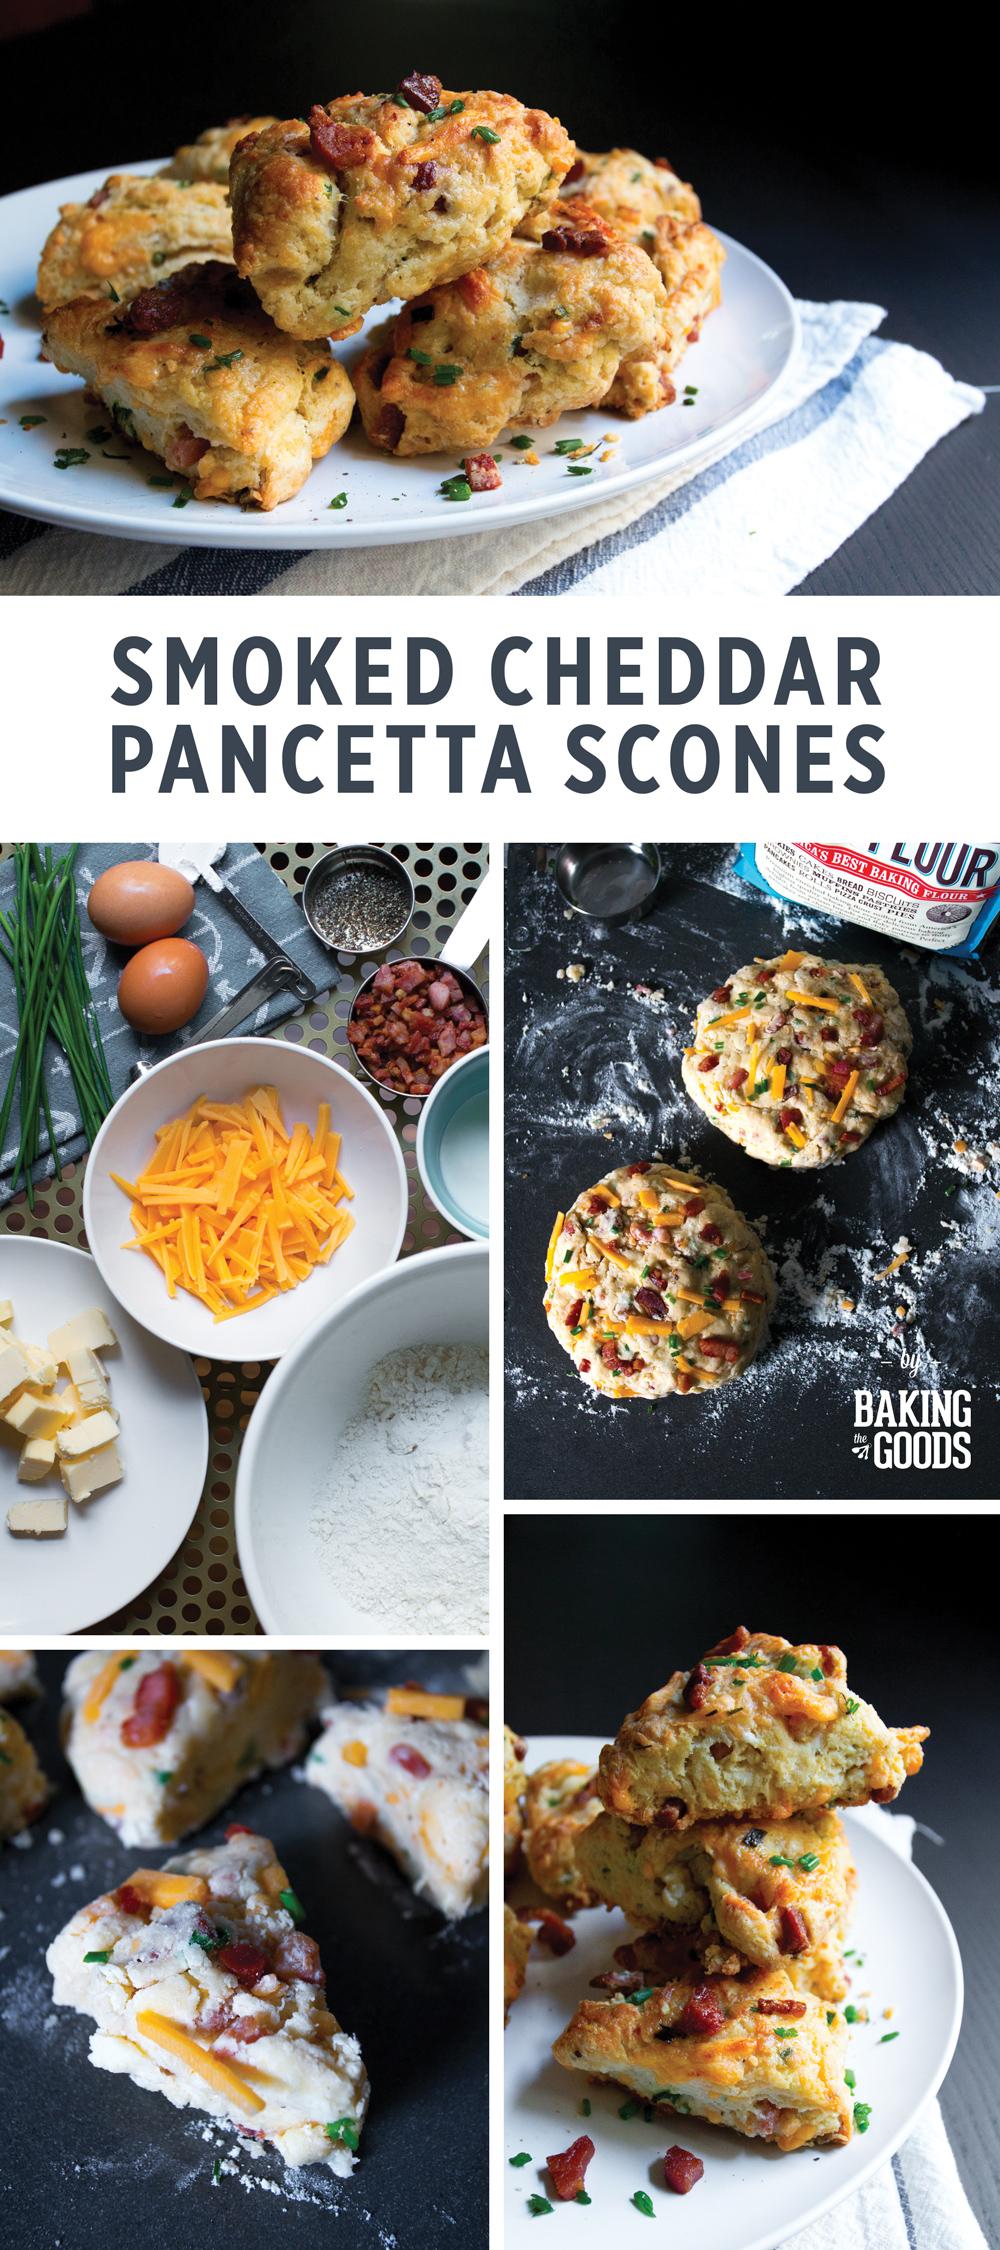 smoked-cheddar-pancetta-scones-skyscraper